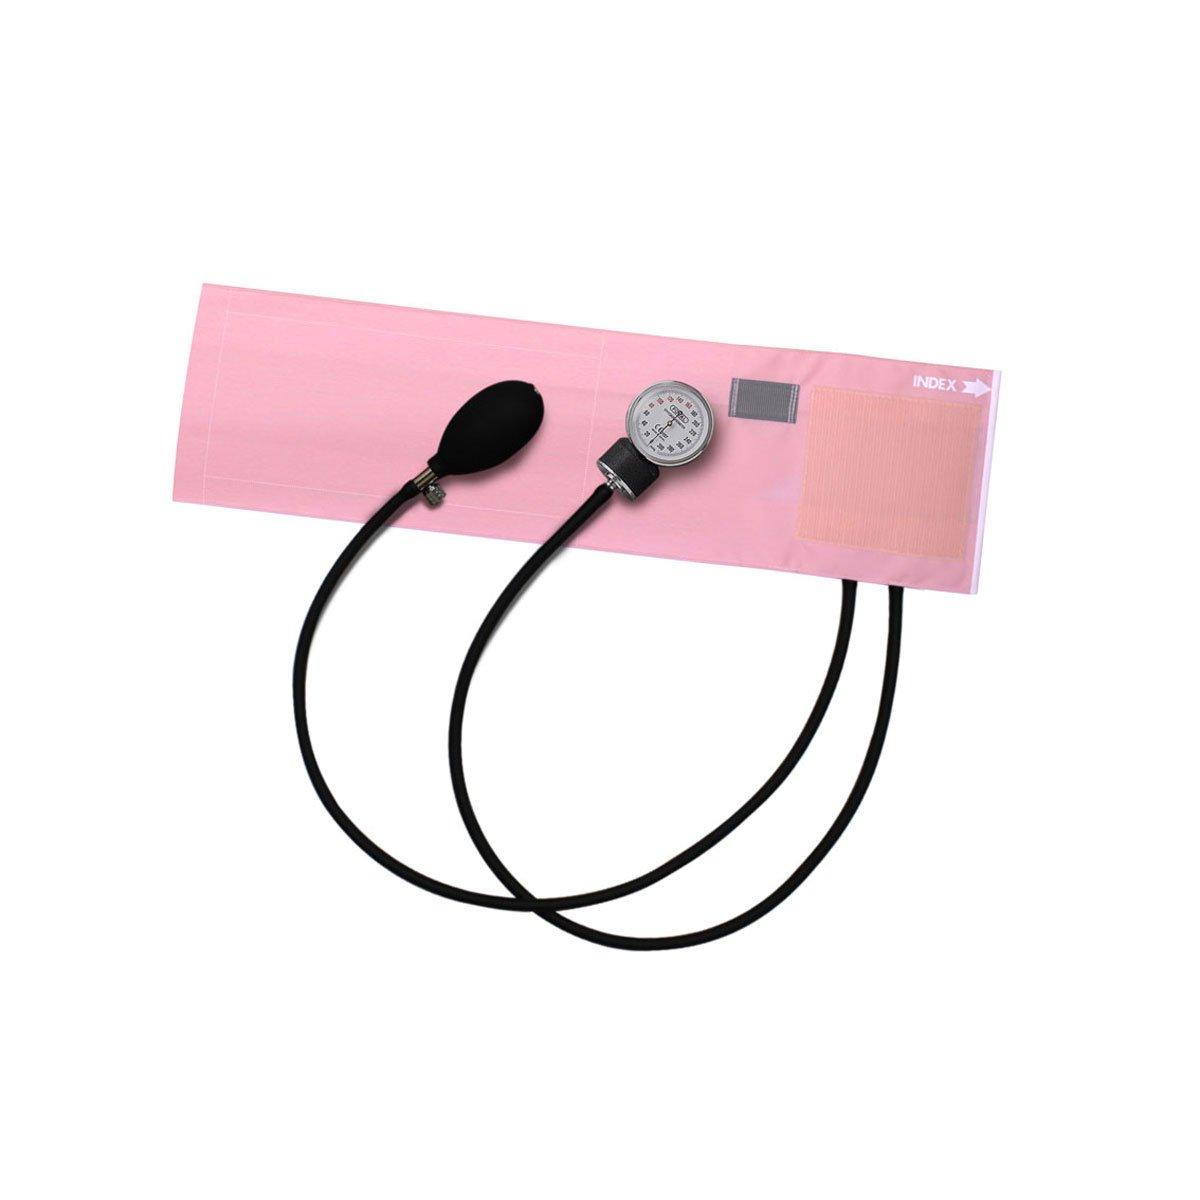 FOCAL アネロイド血圧計 FC-100V イージーリリースバルブ付 ナイロンカフ ピンク【4個セット】   B00FWNQXLK